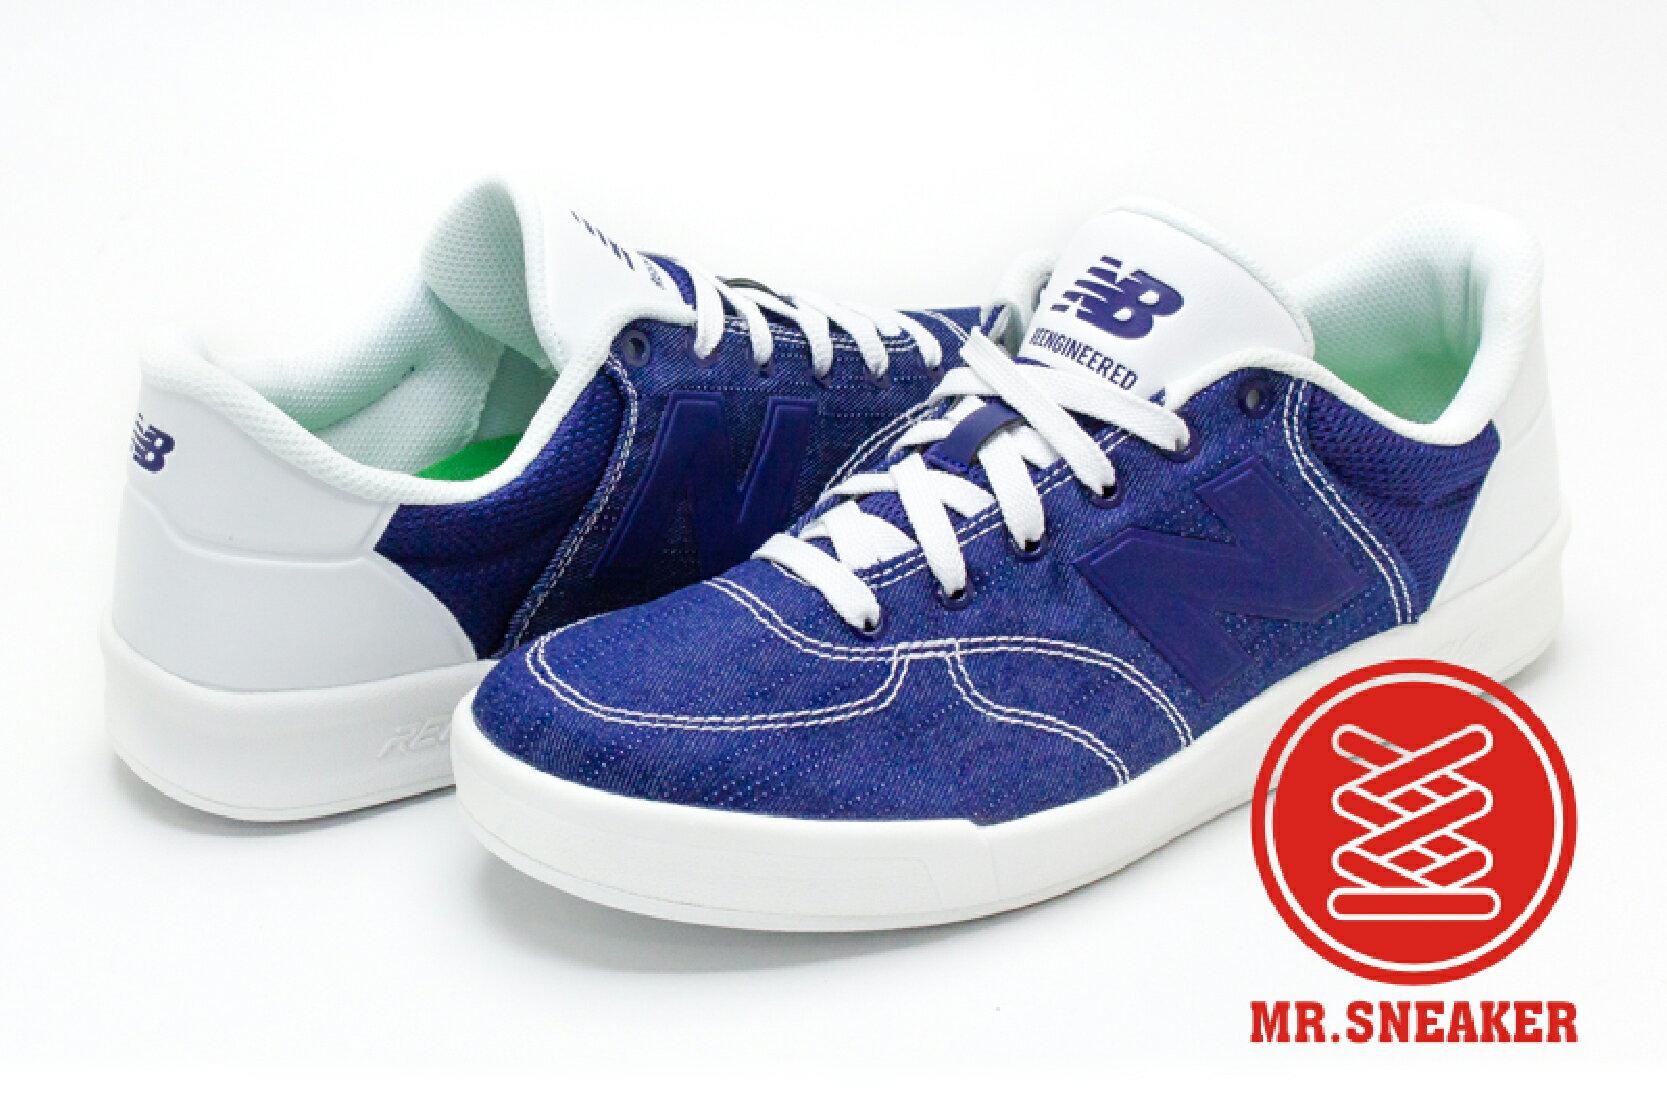 ☆Mr.Sneaker☆NEW BALANCE CRT300RK 韓系 NB帆布鞋 現貨 台灣公司正品 丹寧